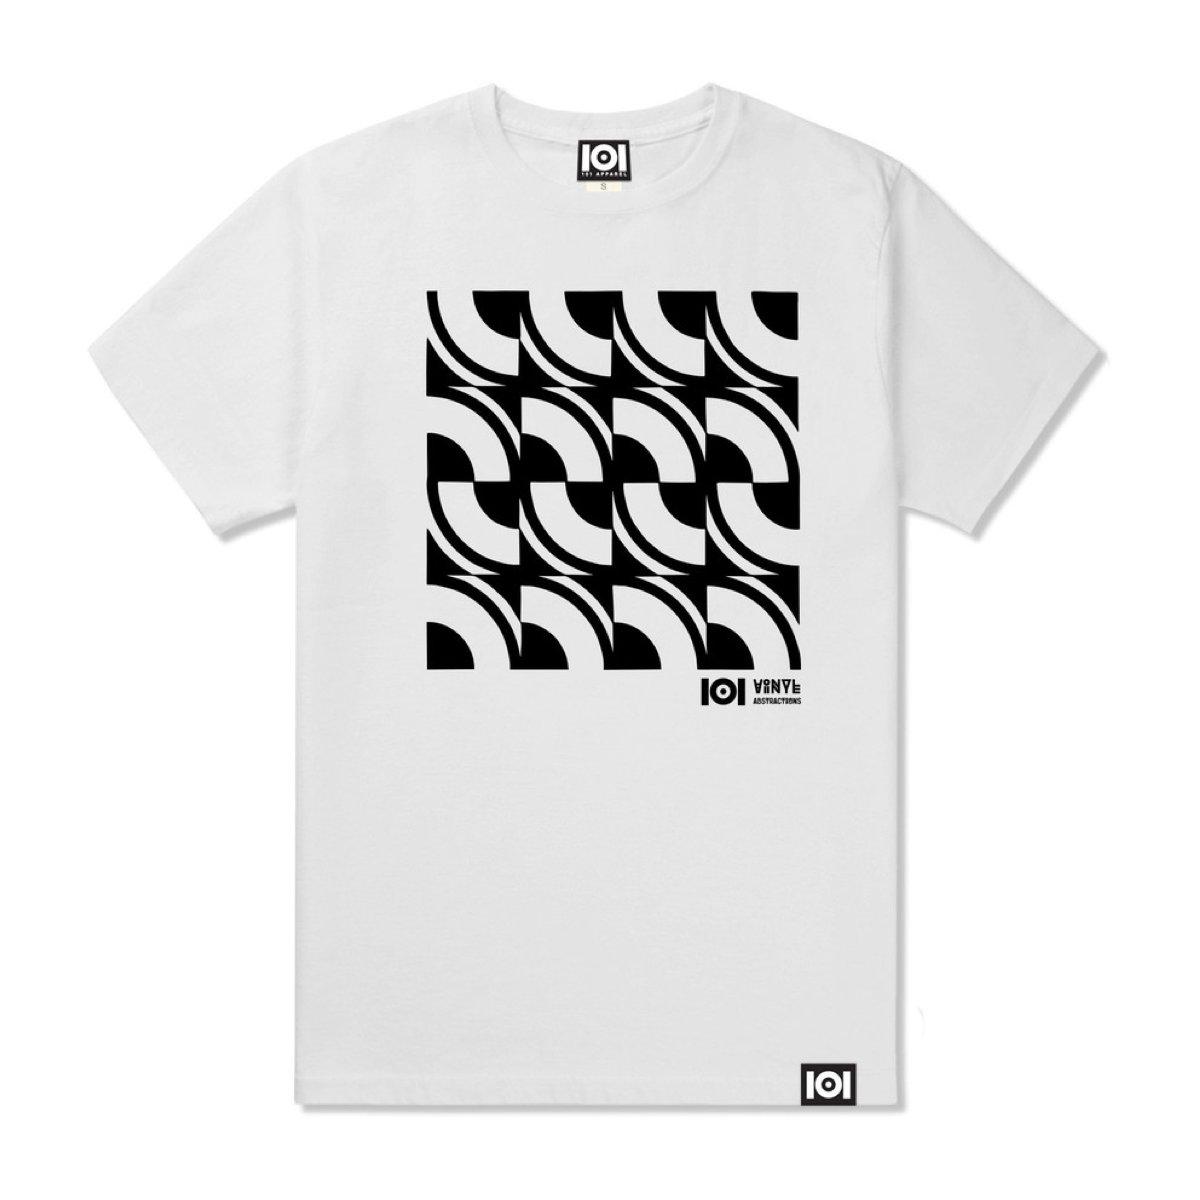 101 Apparel Vinyl Abstractions 4 White T Shirt Medium Size